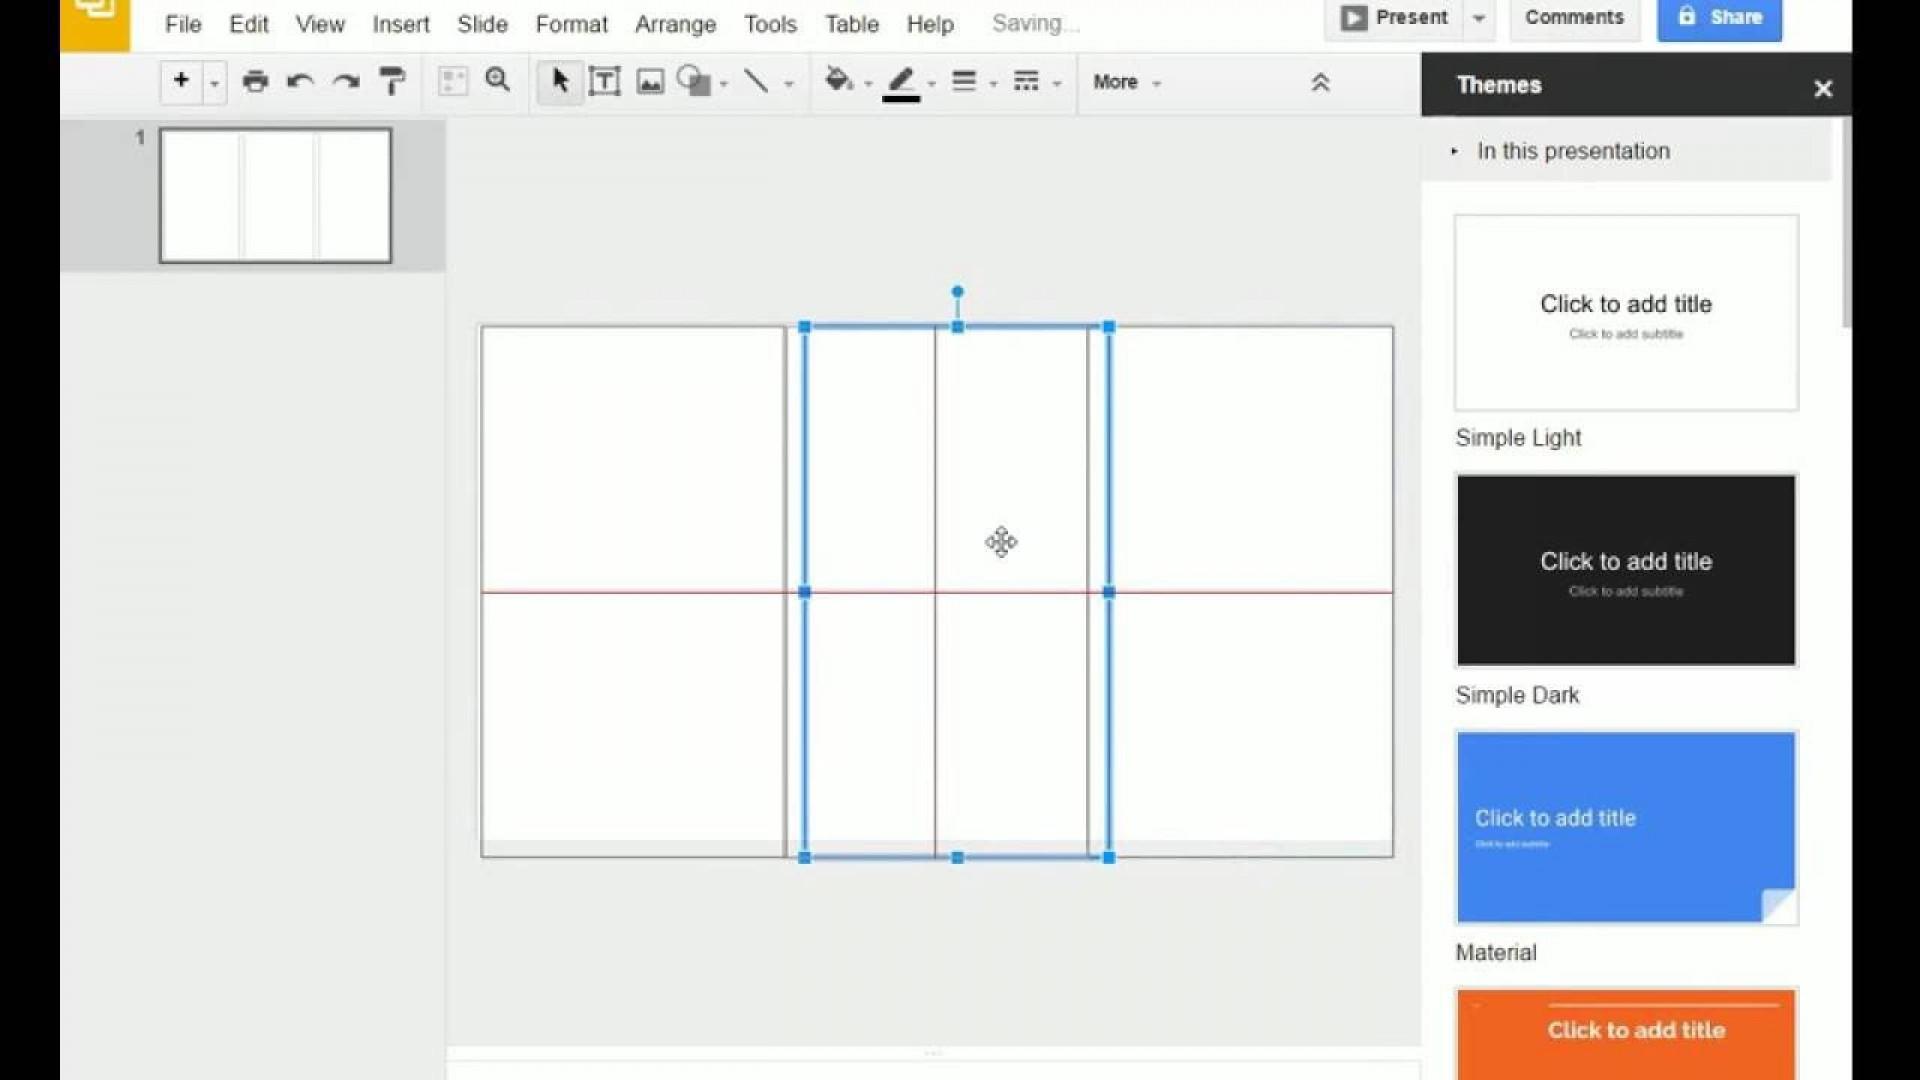 002 Outstanding Three Fold Brochure Template Google Doc High Definition  Docs1920